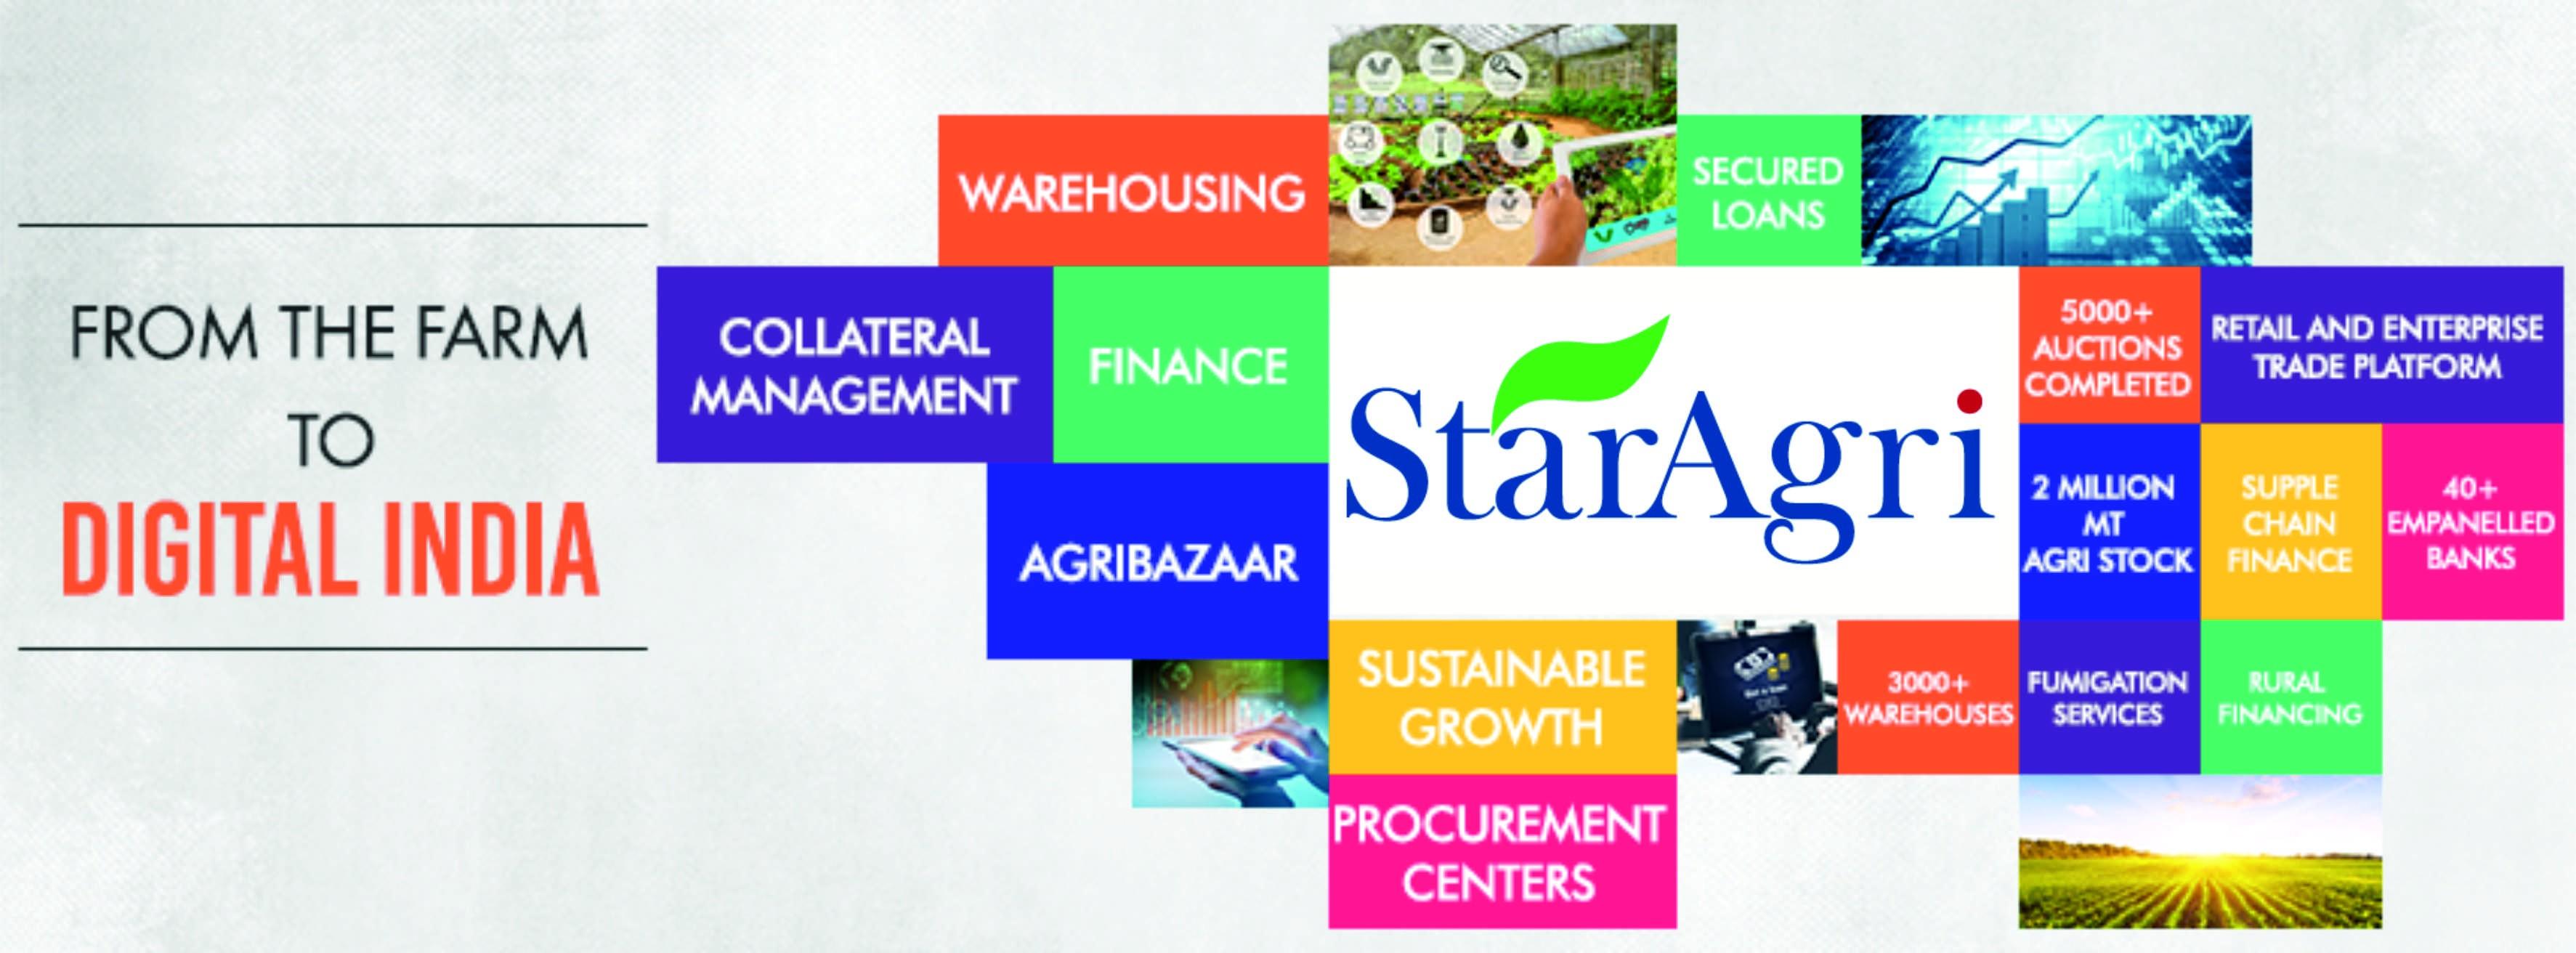 Star Agriwarehousing & Collateral Management Ltd | LinkedIn